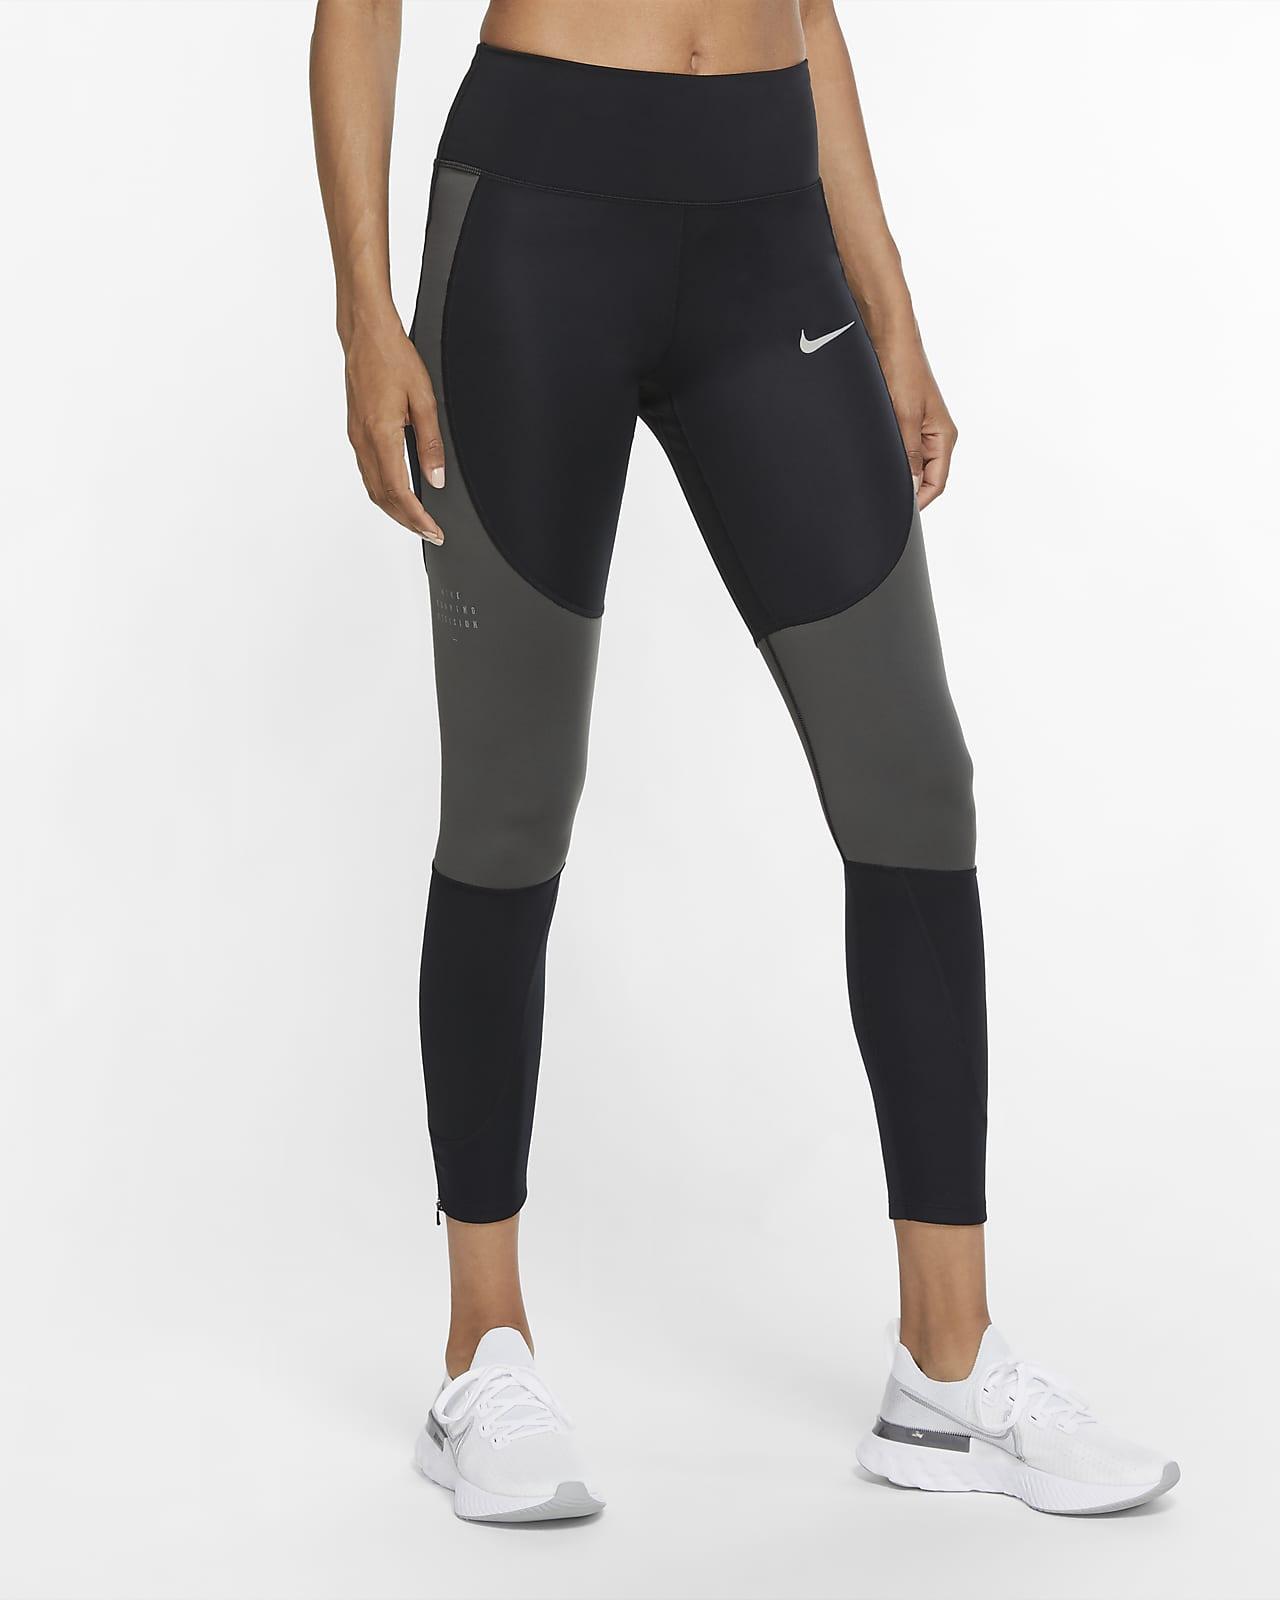 Nike Epic Luxe Run Division Women's Running Leggings